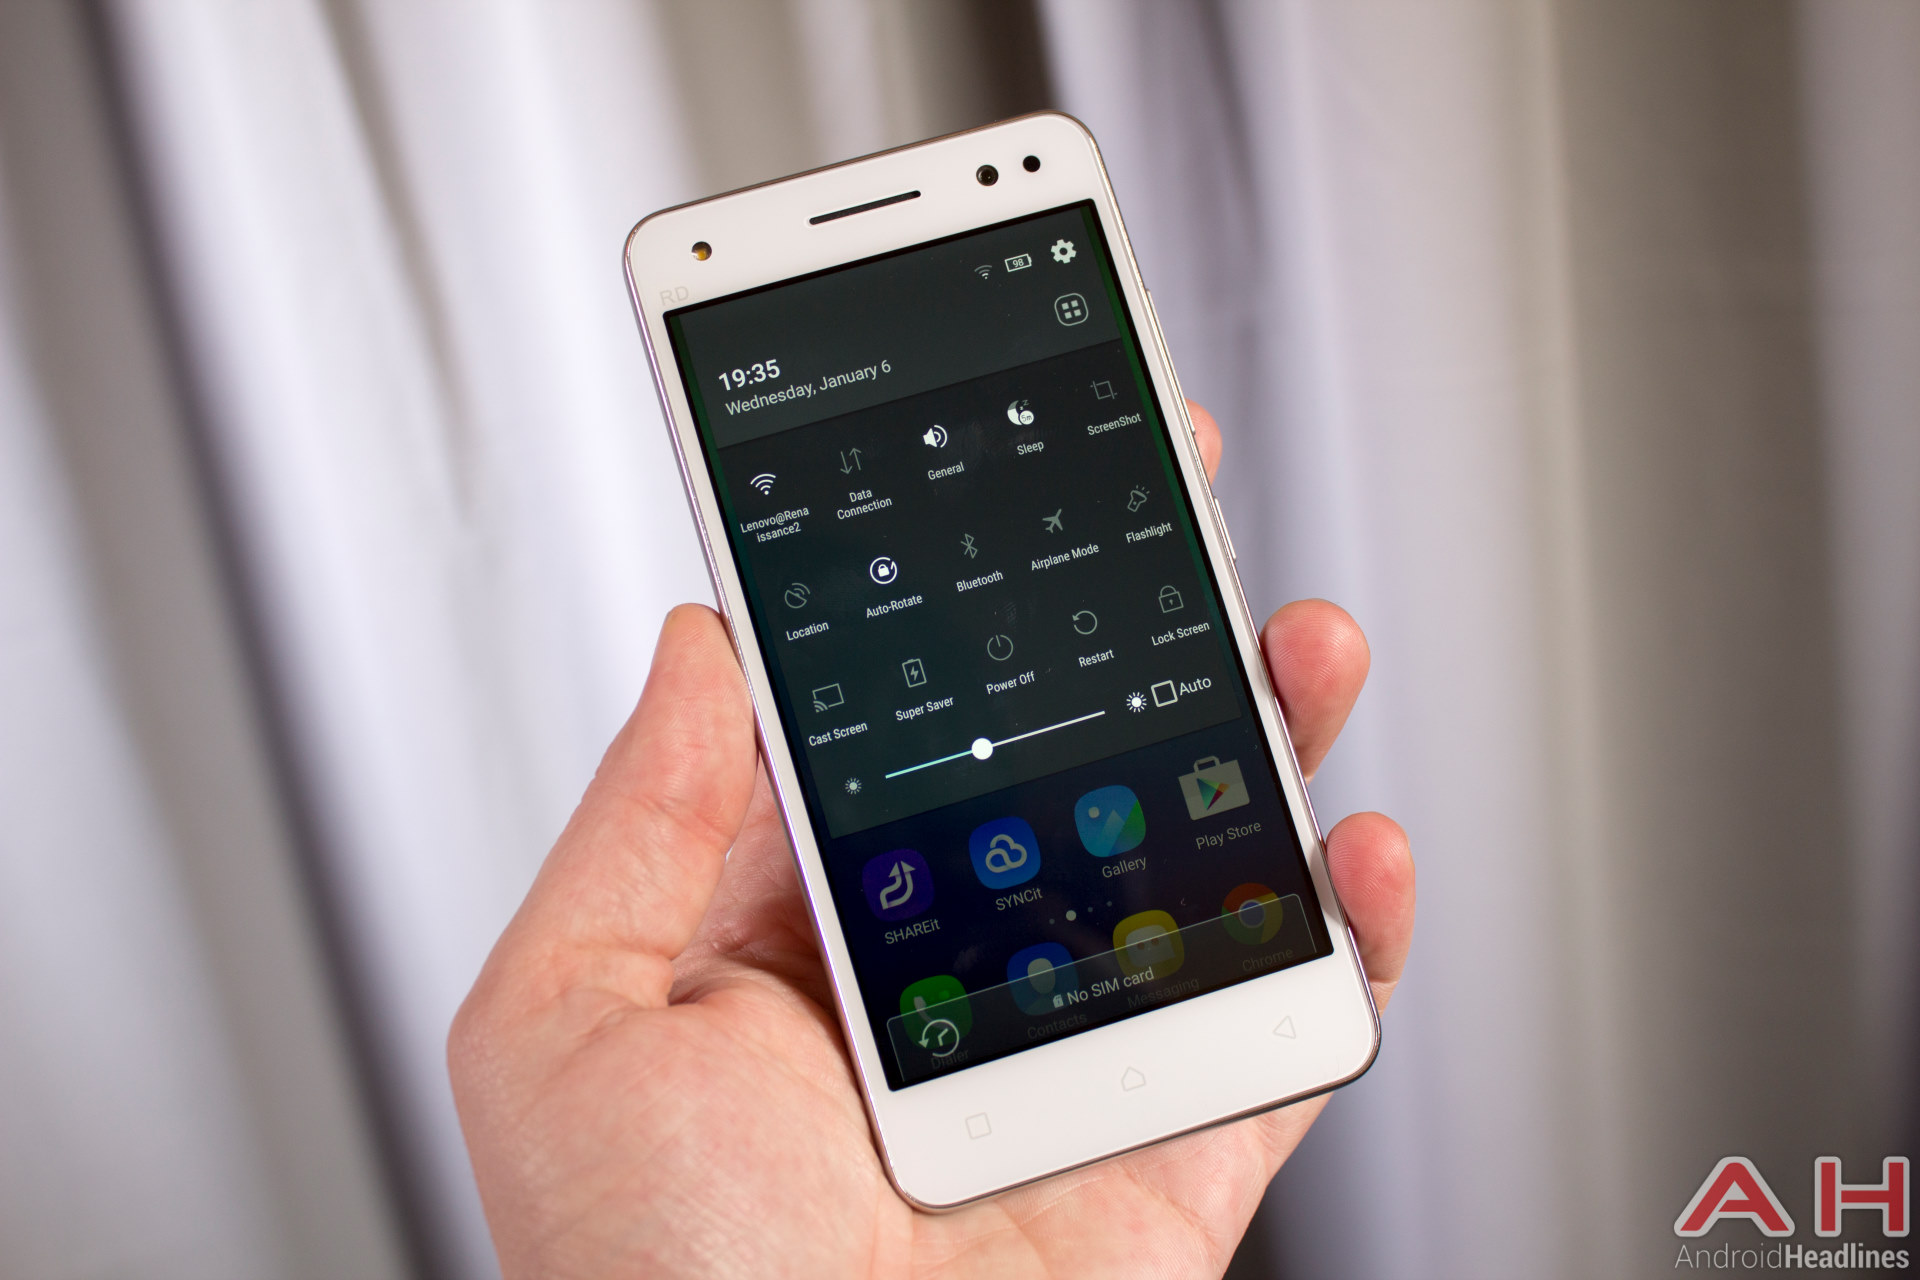 لينوفو تطلق هاتف Vibe S1 Lite الذكي بمواصفات عالية وسعر 199 دولار فقط